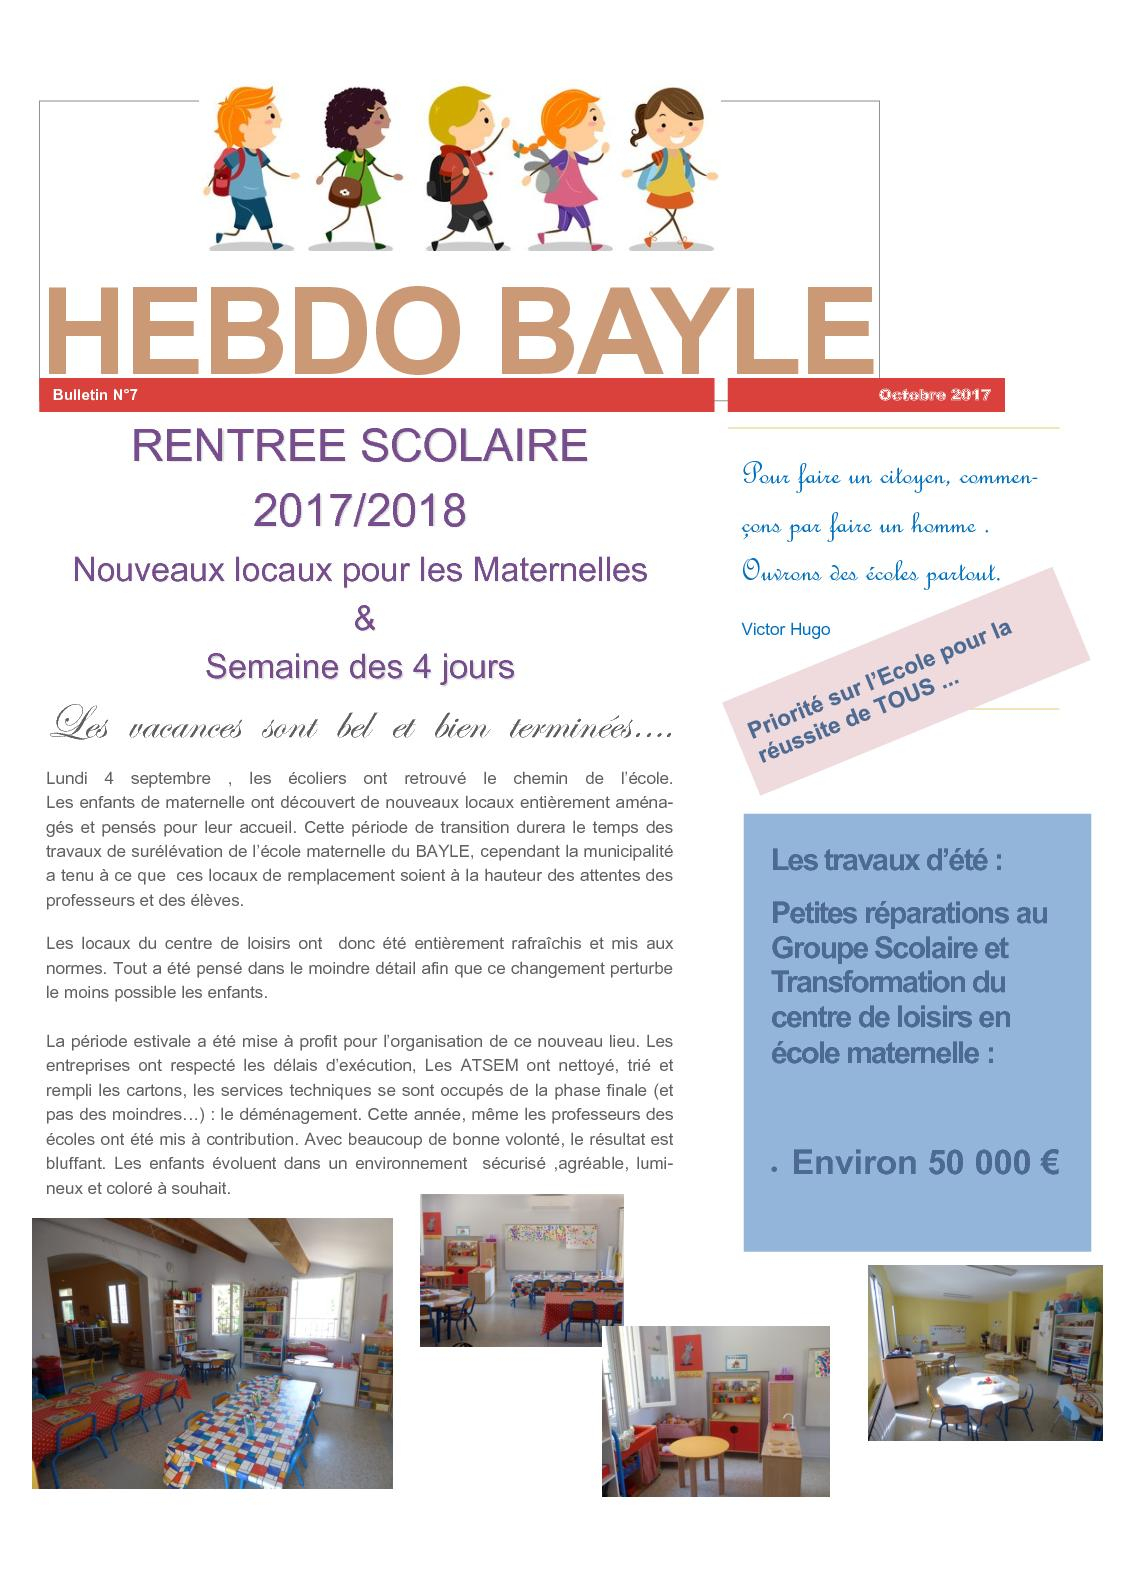 Calaméo - Hebobayle N°7 serapportantà Piscine Harjes